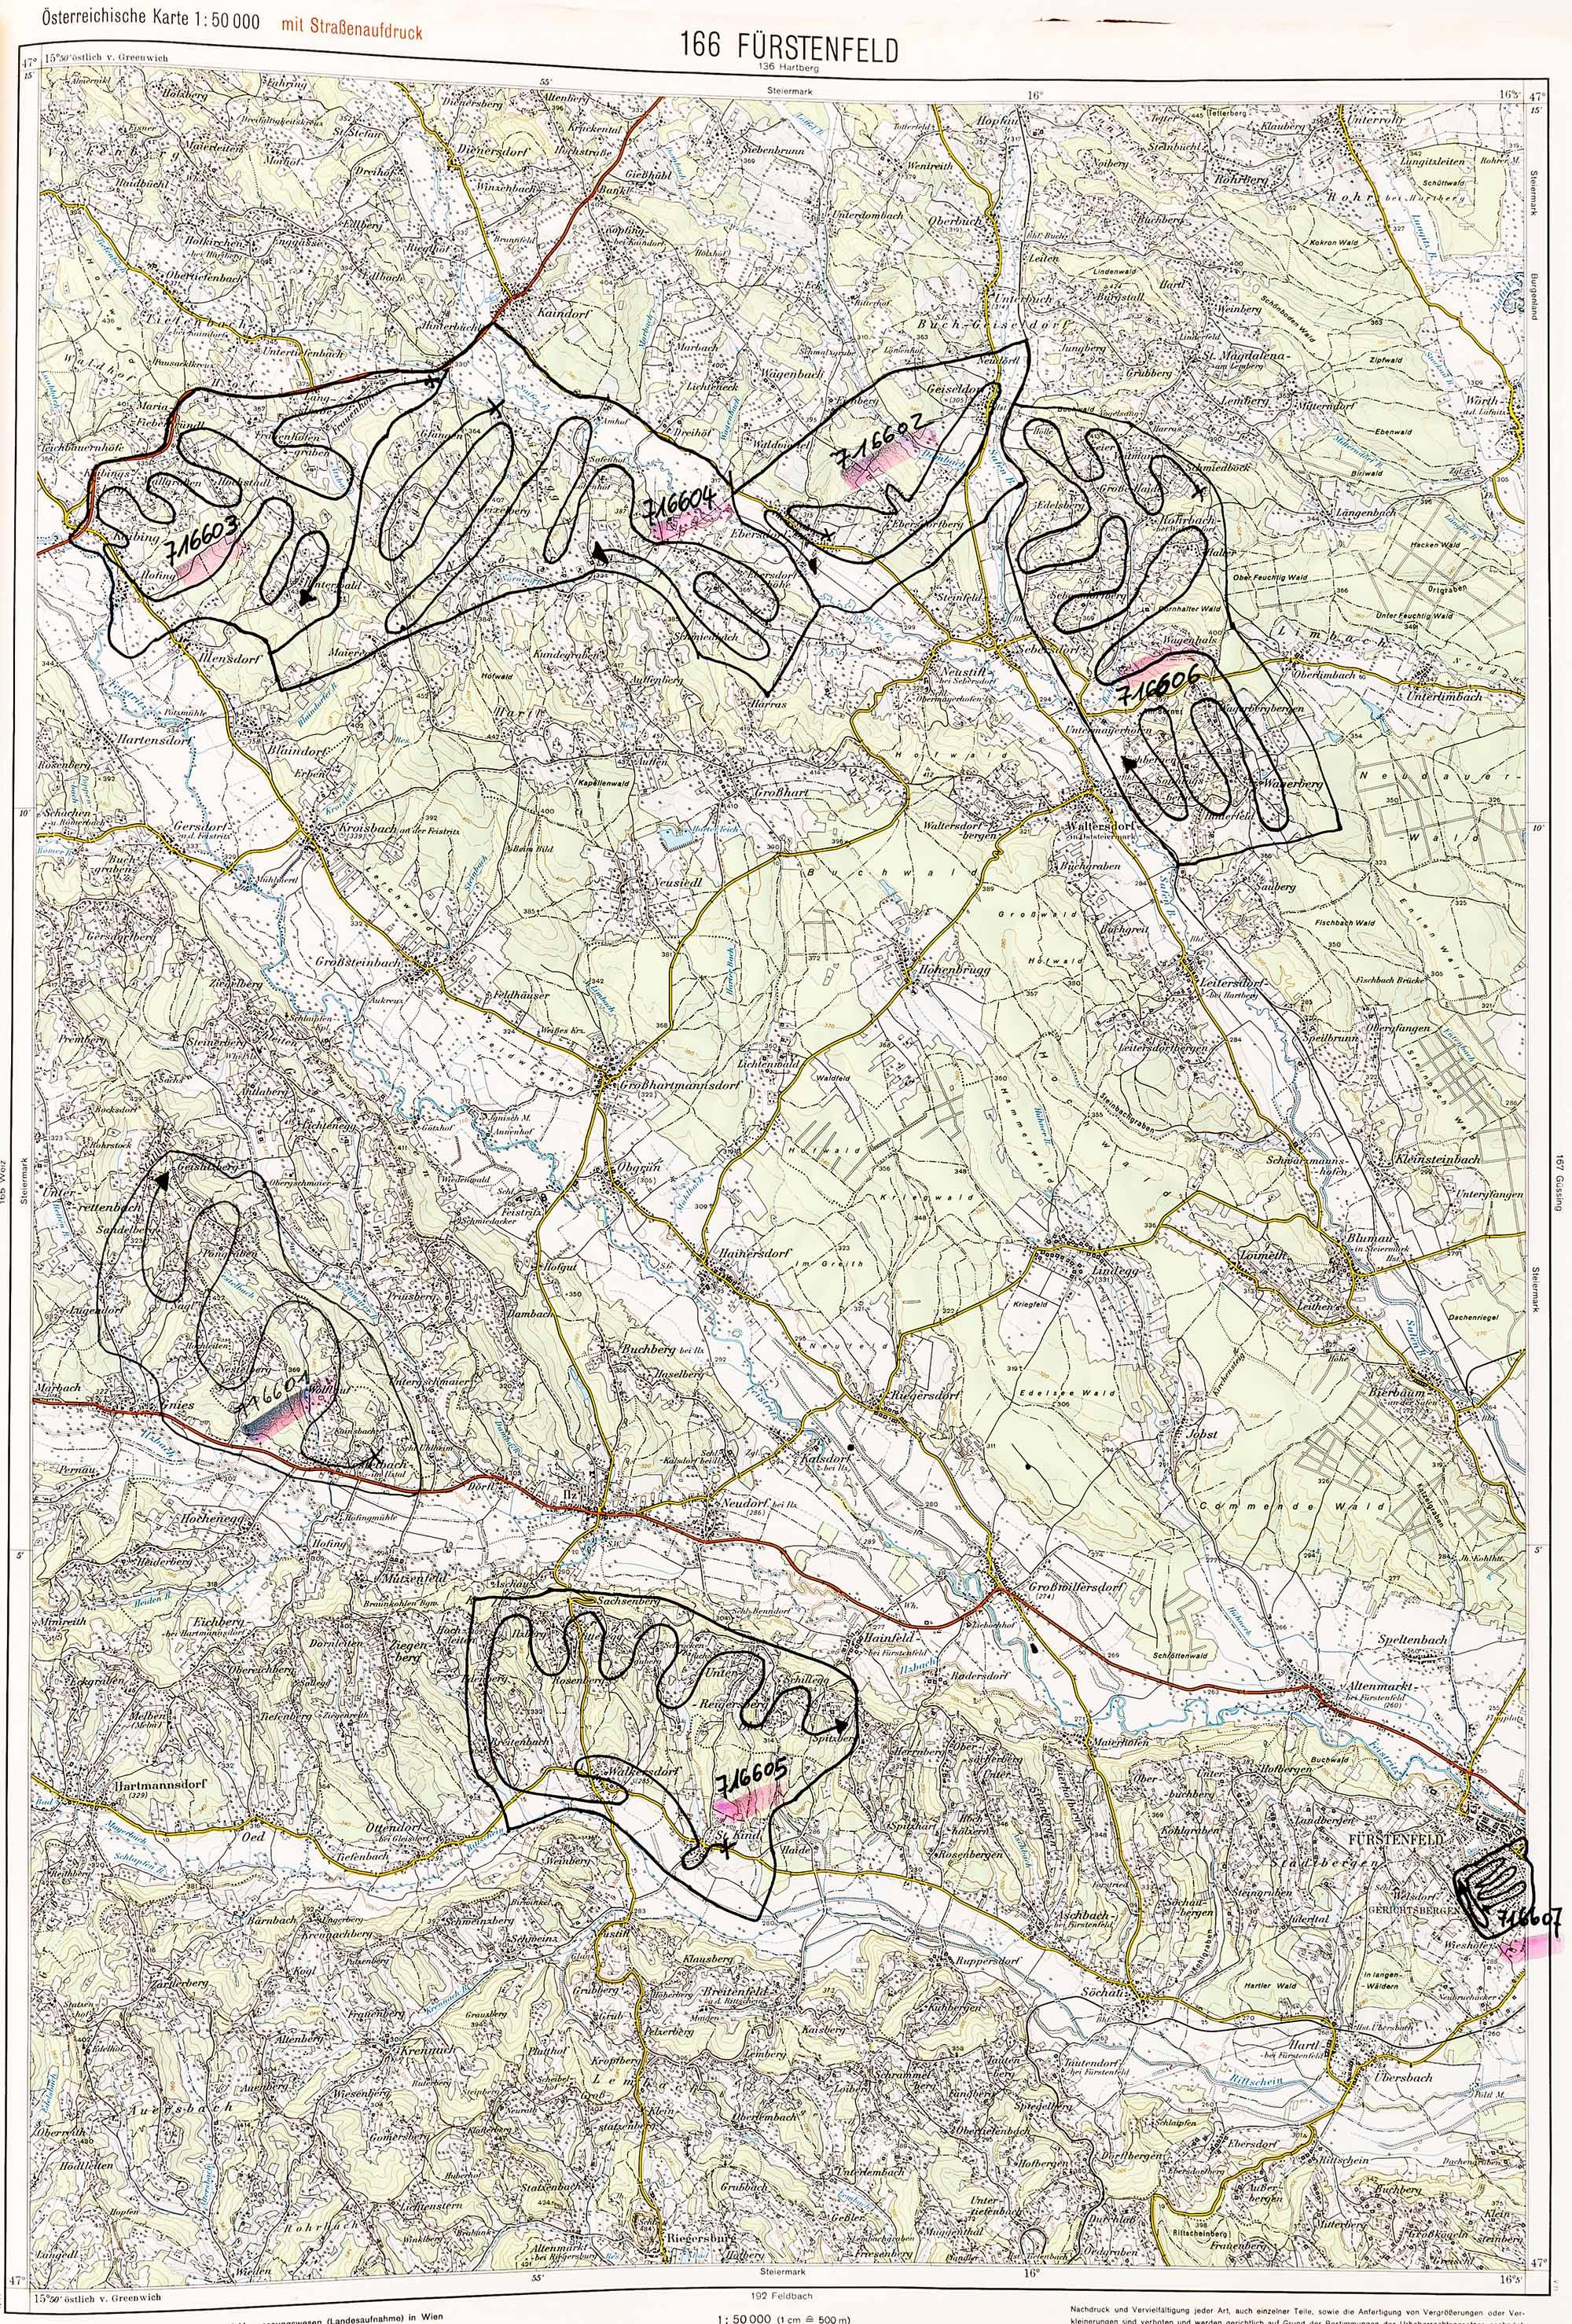 1975-1979 Karte 166